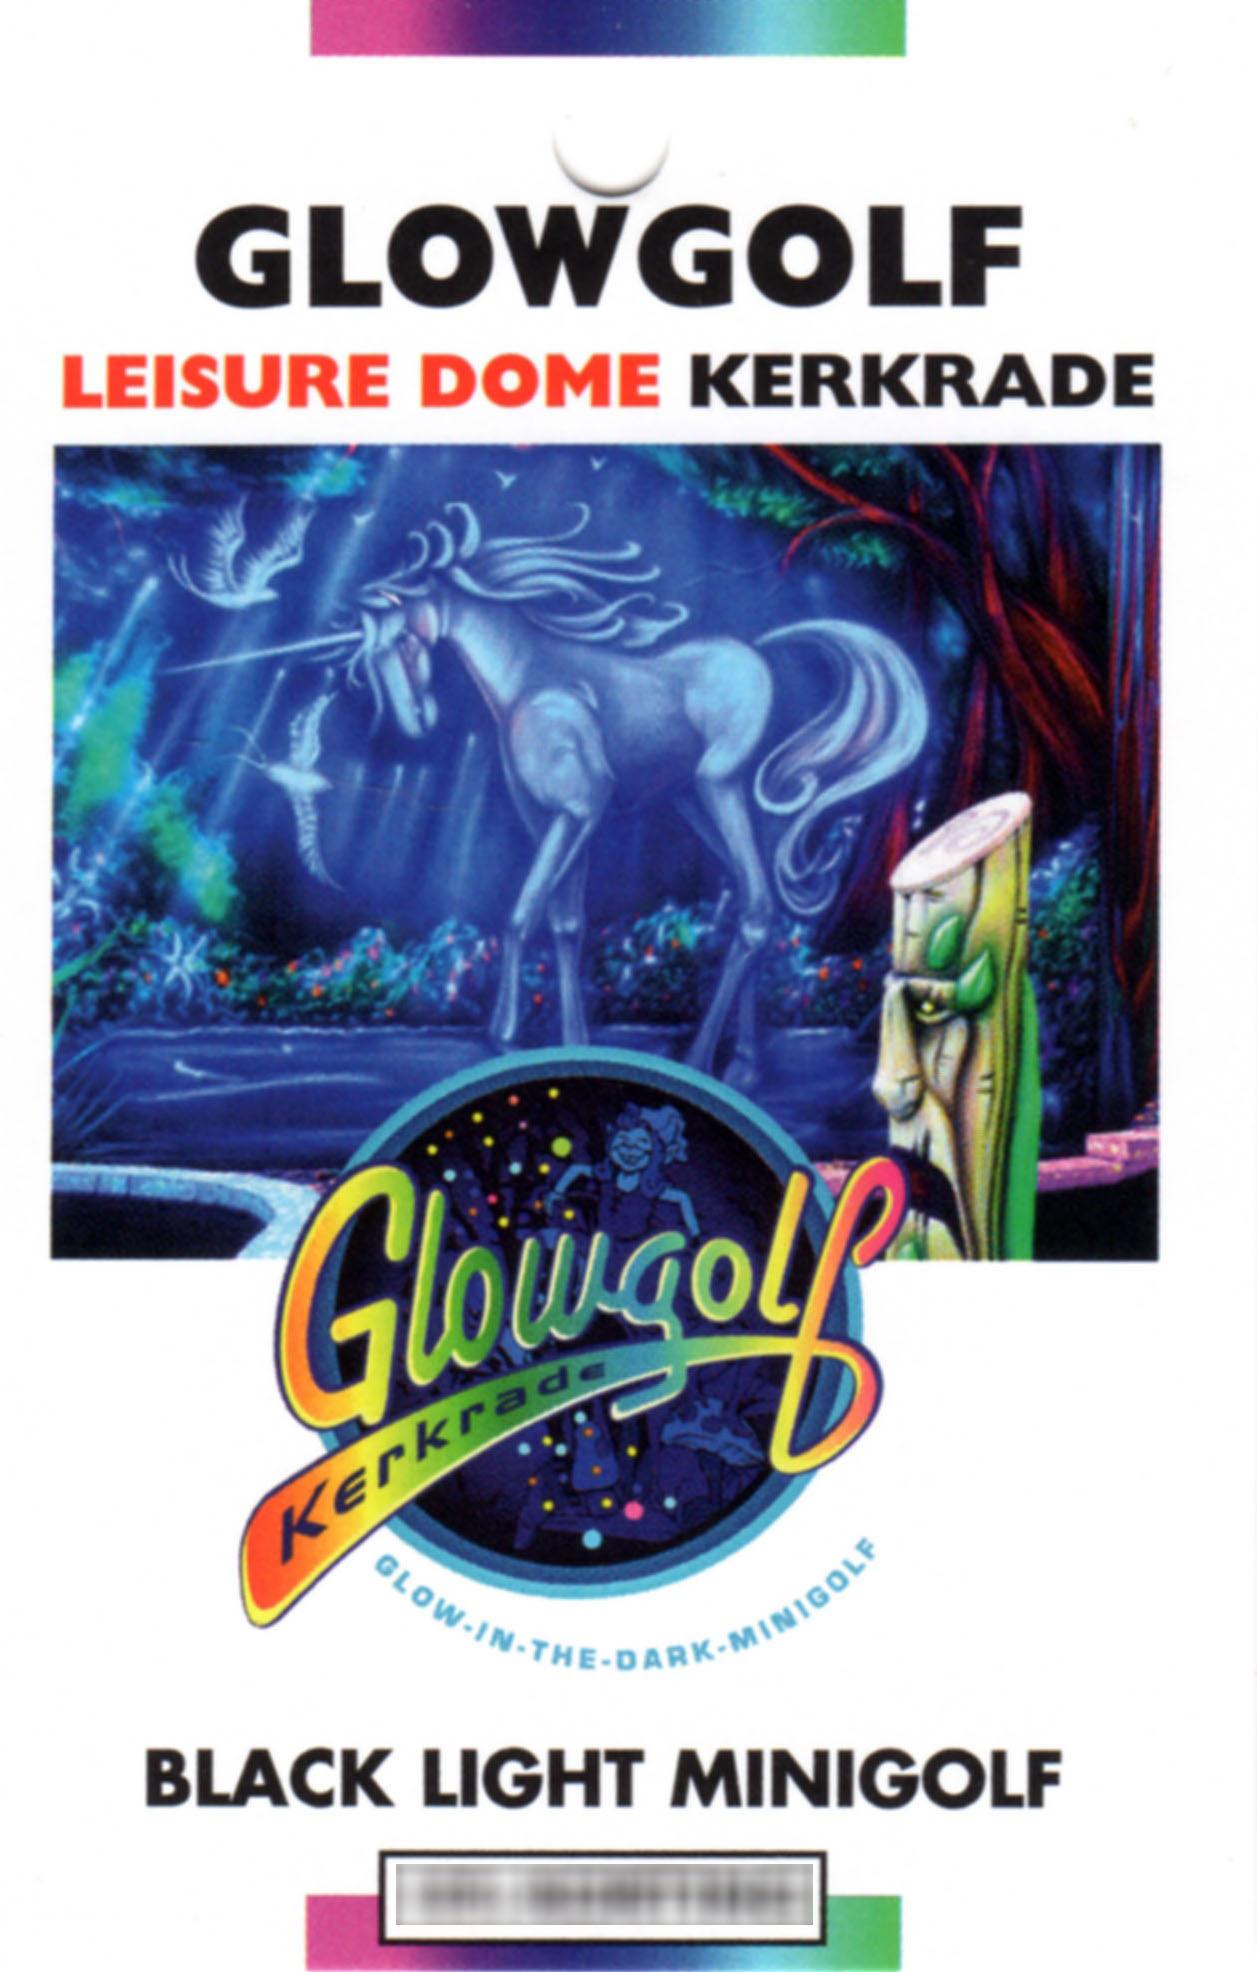 Glowgolf Leisure Dome Kerkrade